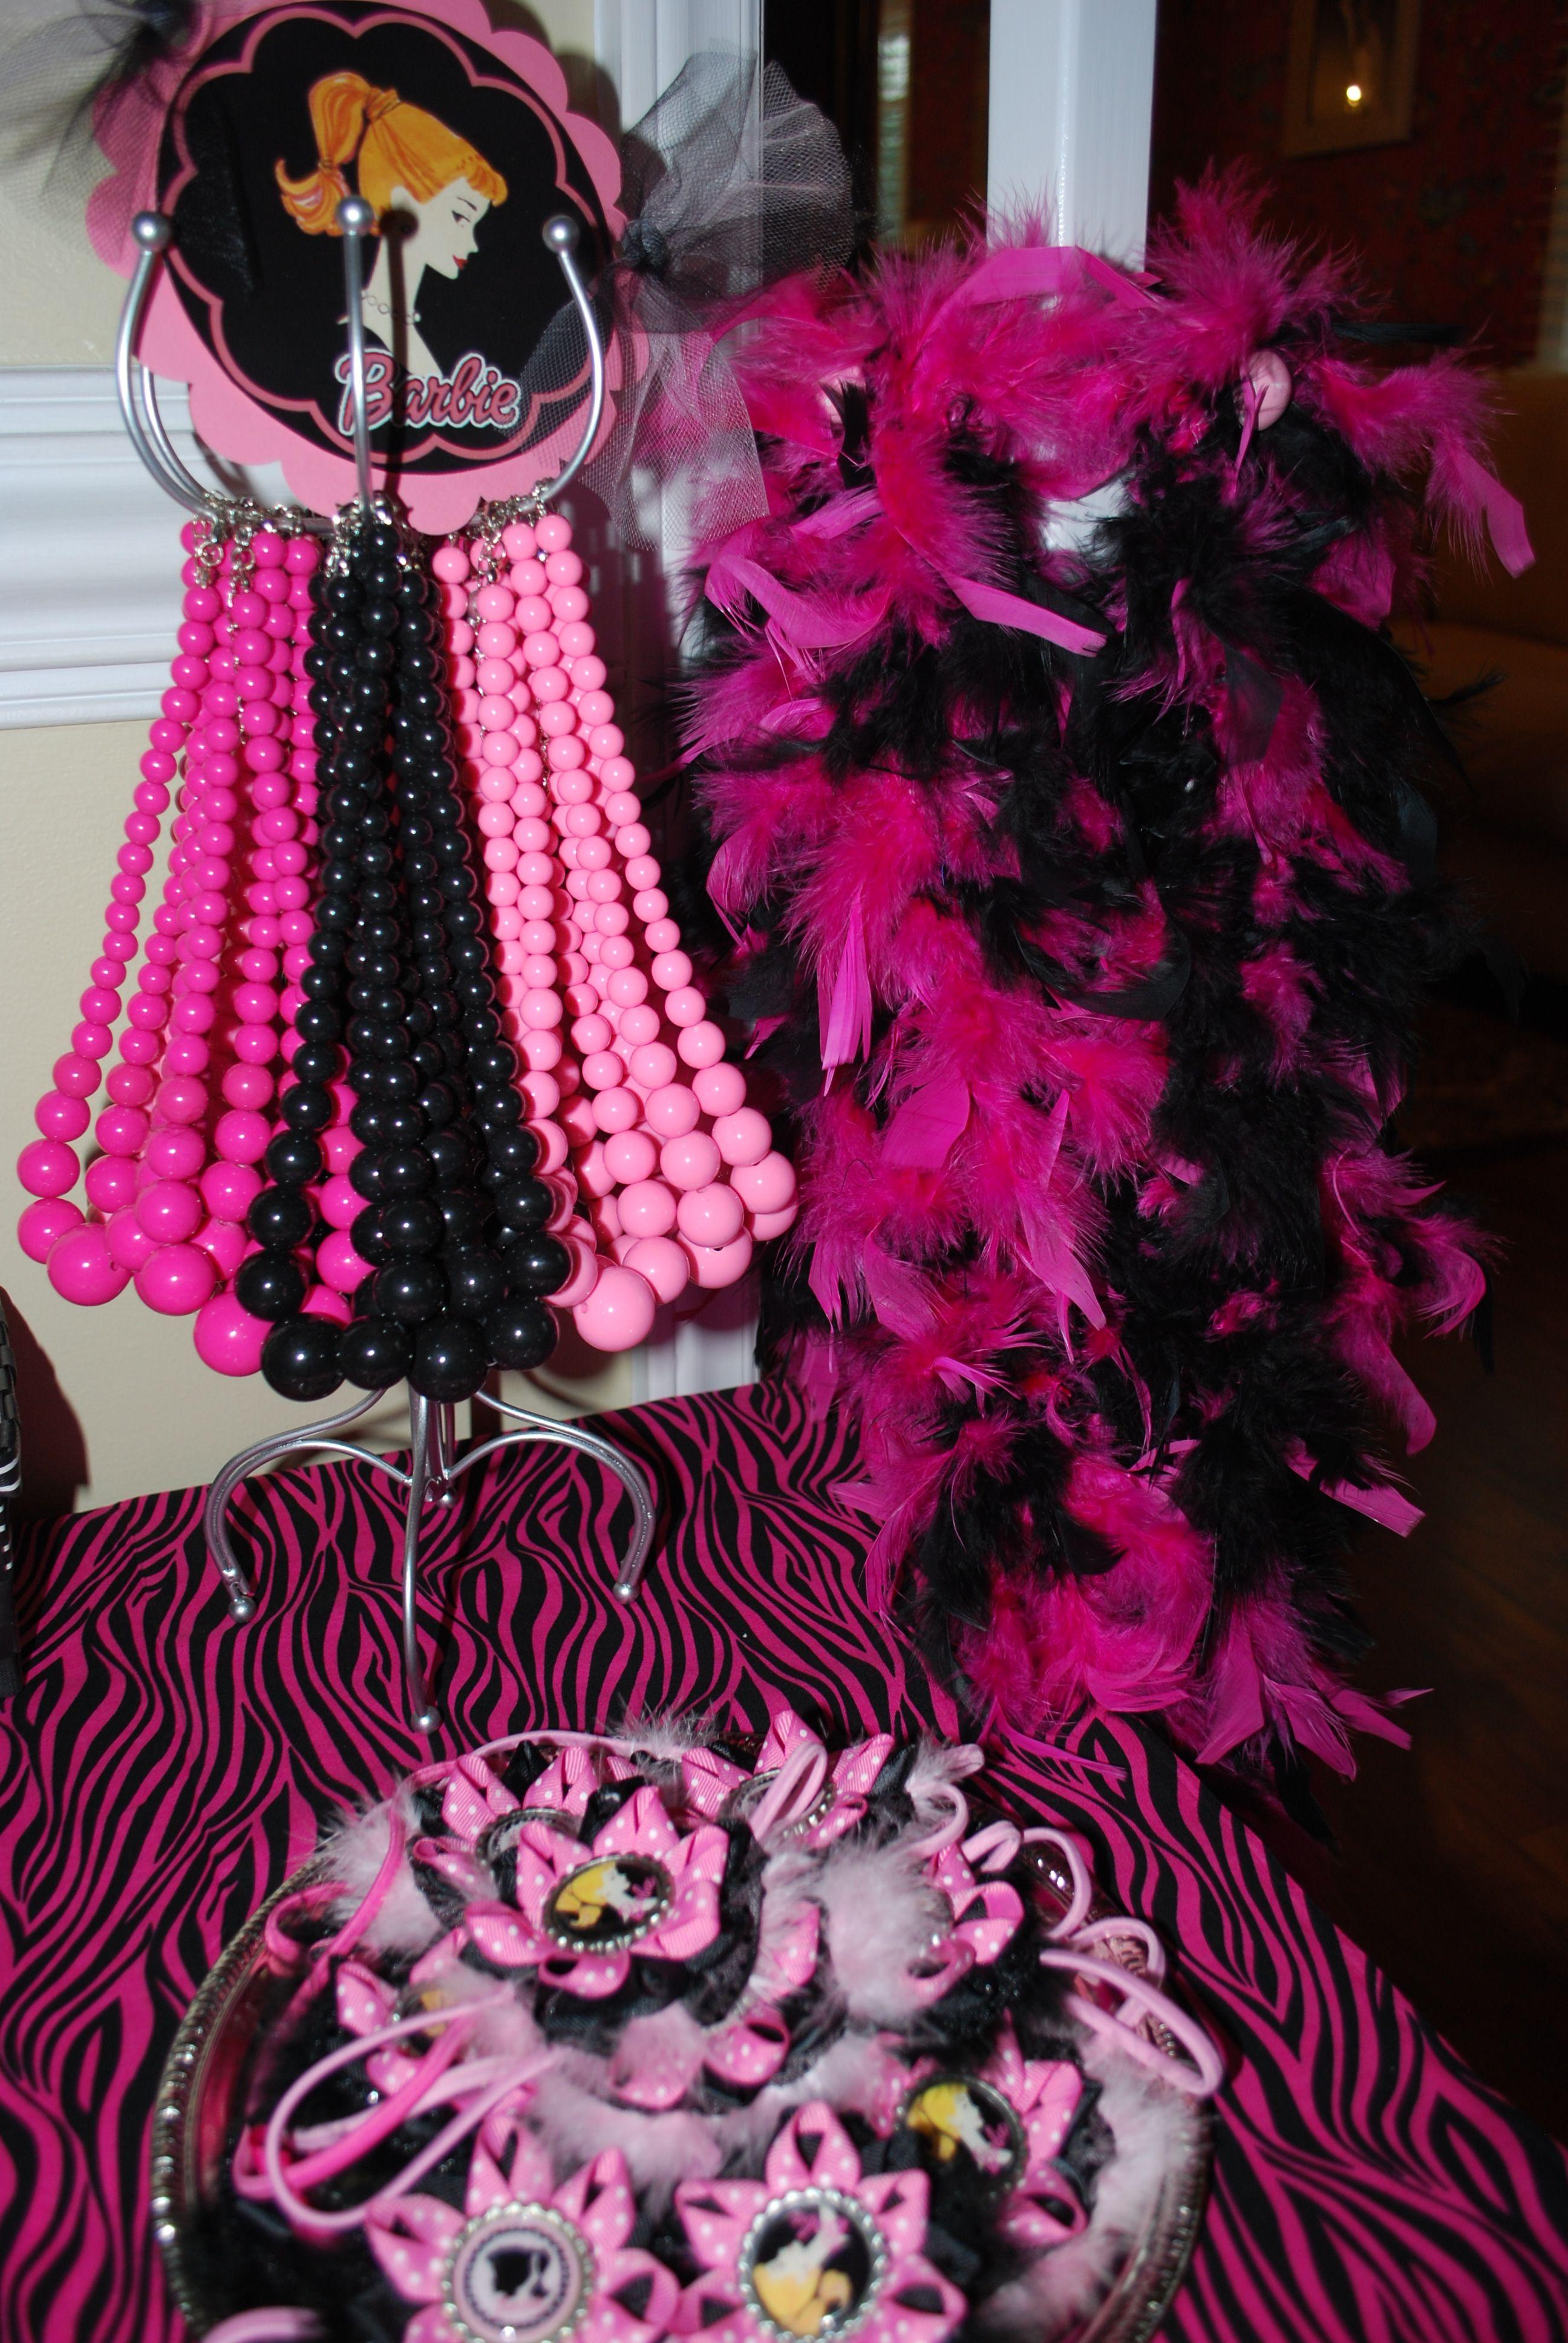 Pin de Giovana Peixoto en Barbie moda e magia | Pinterest | Cumple ...